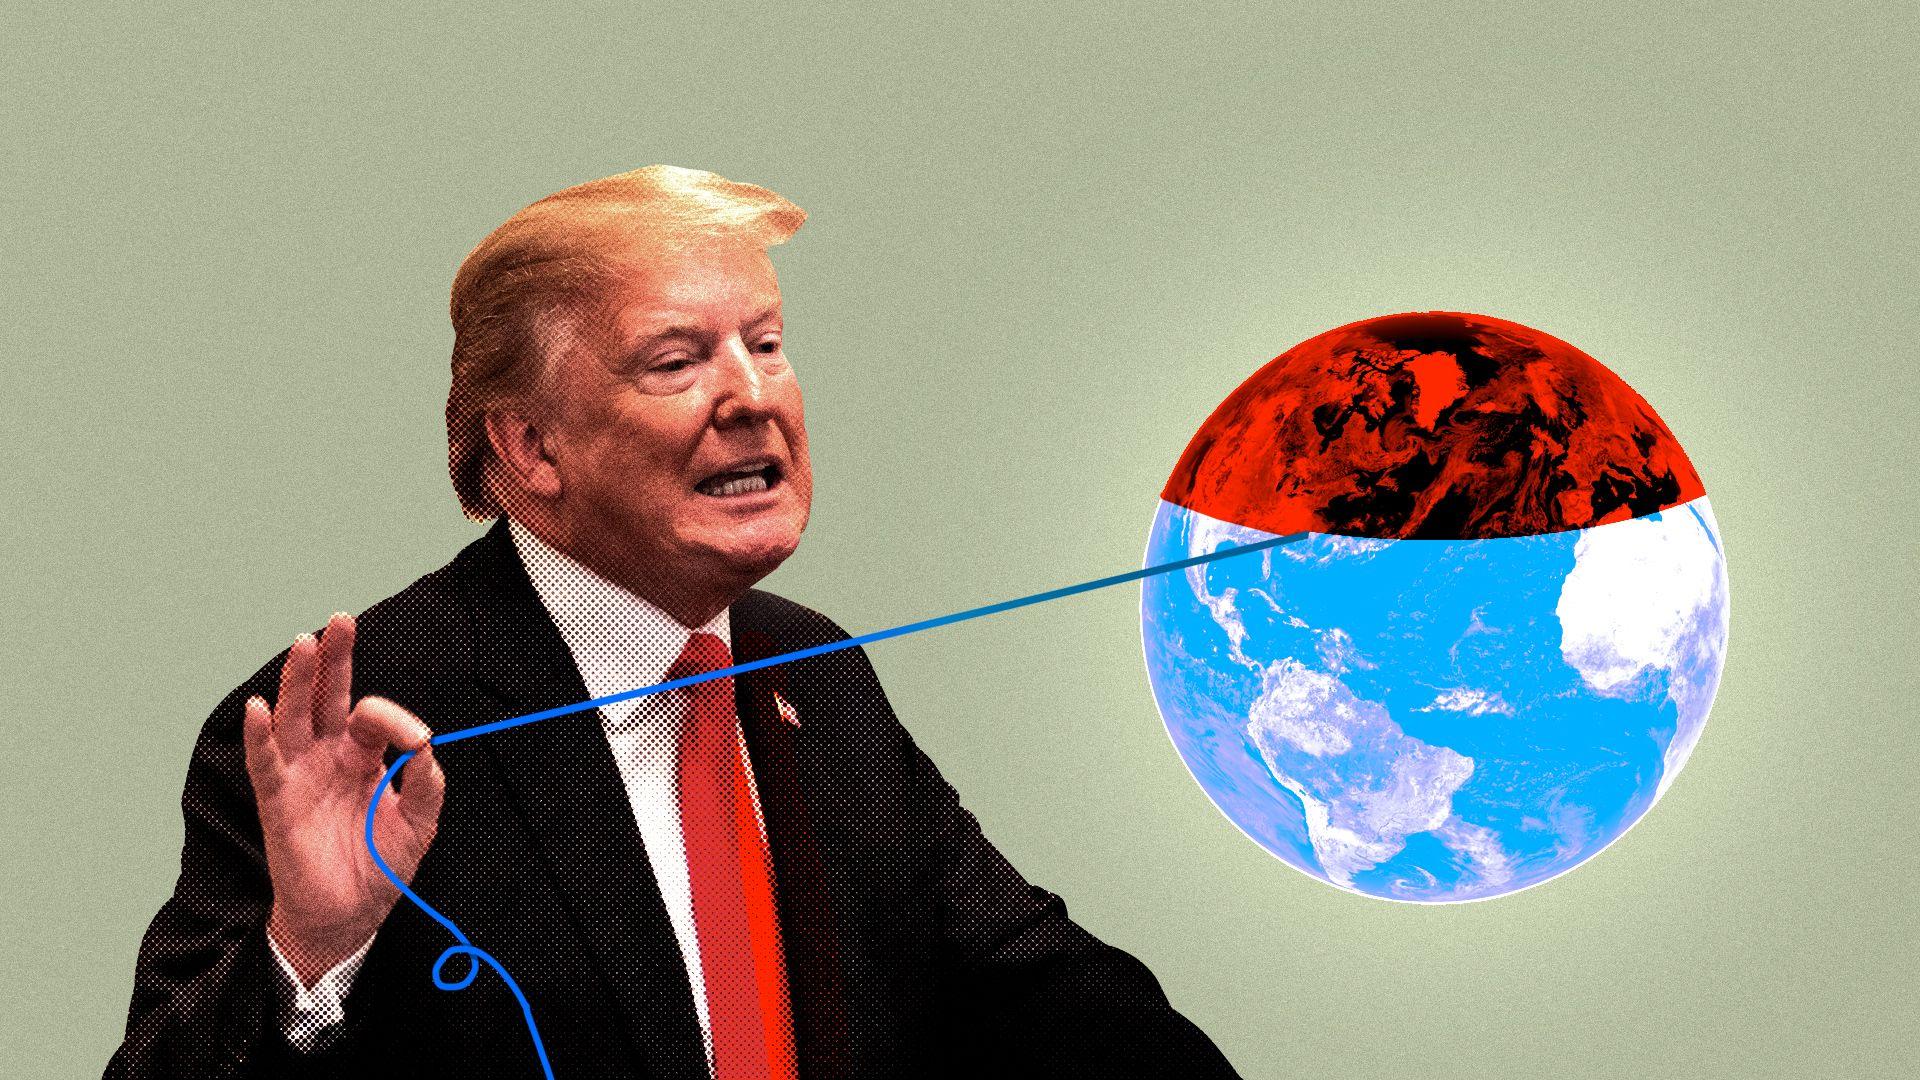 Trump unravels a world globe representing the 20th Century